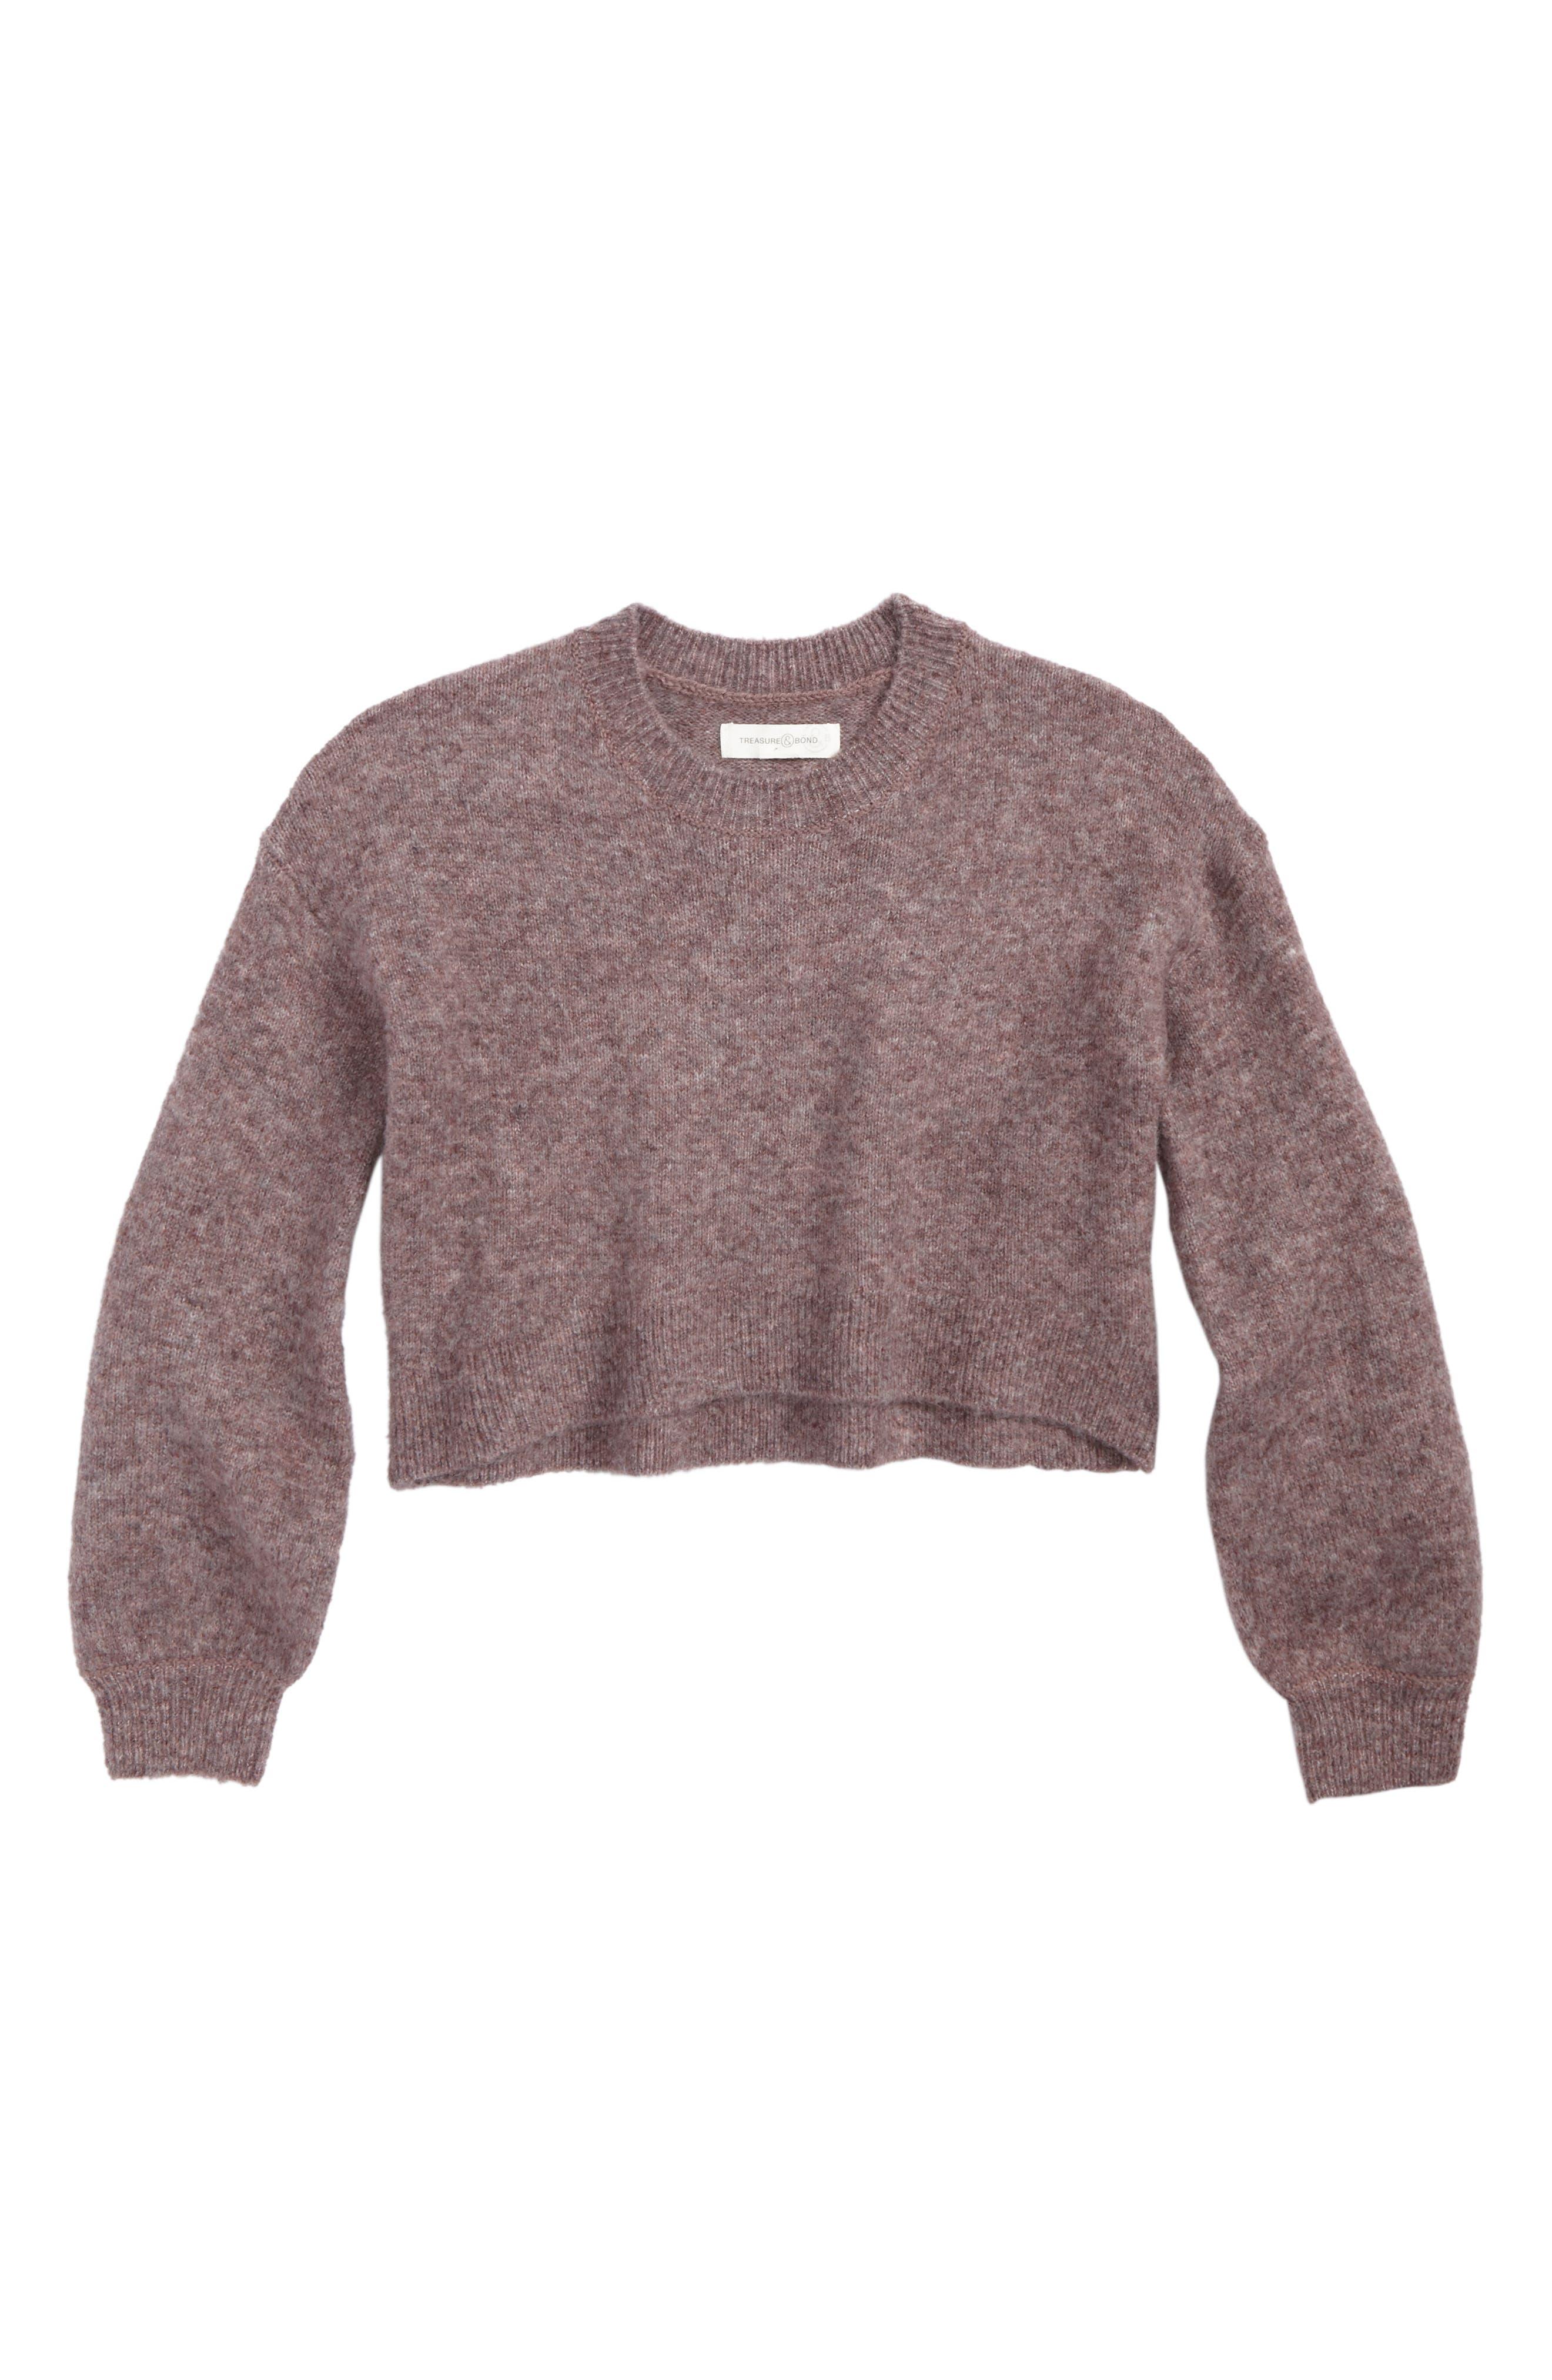 Alternate Image 1 Selected - Treasure & Bond Crop Bubble Sleeve Sweater (Big Girls)